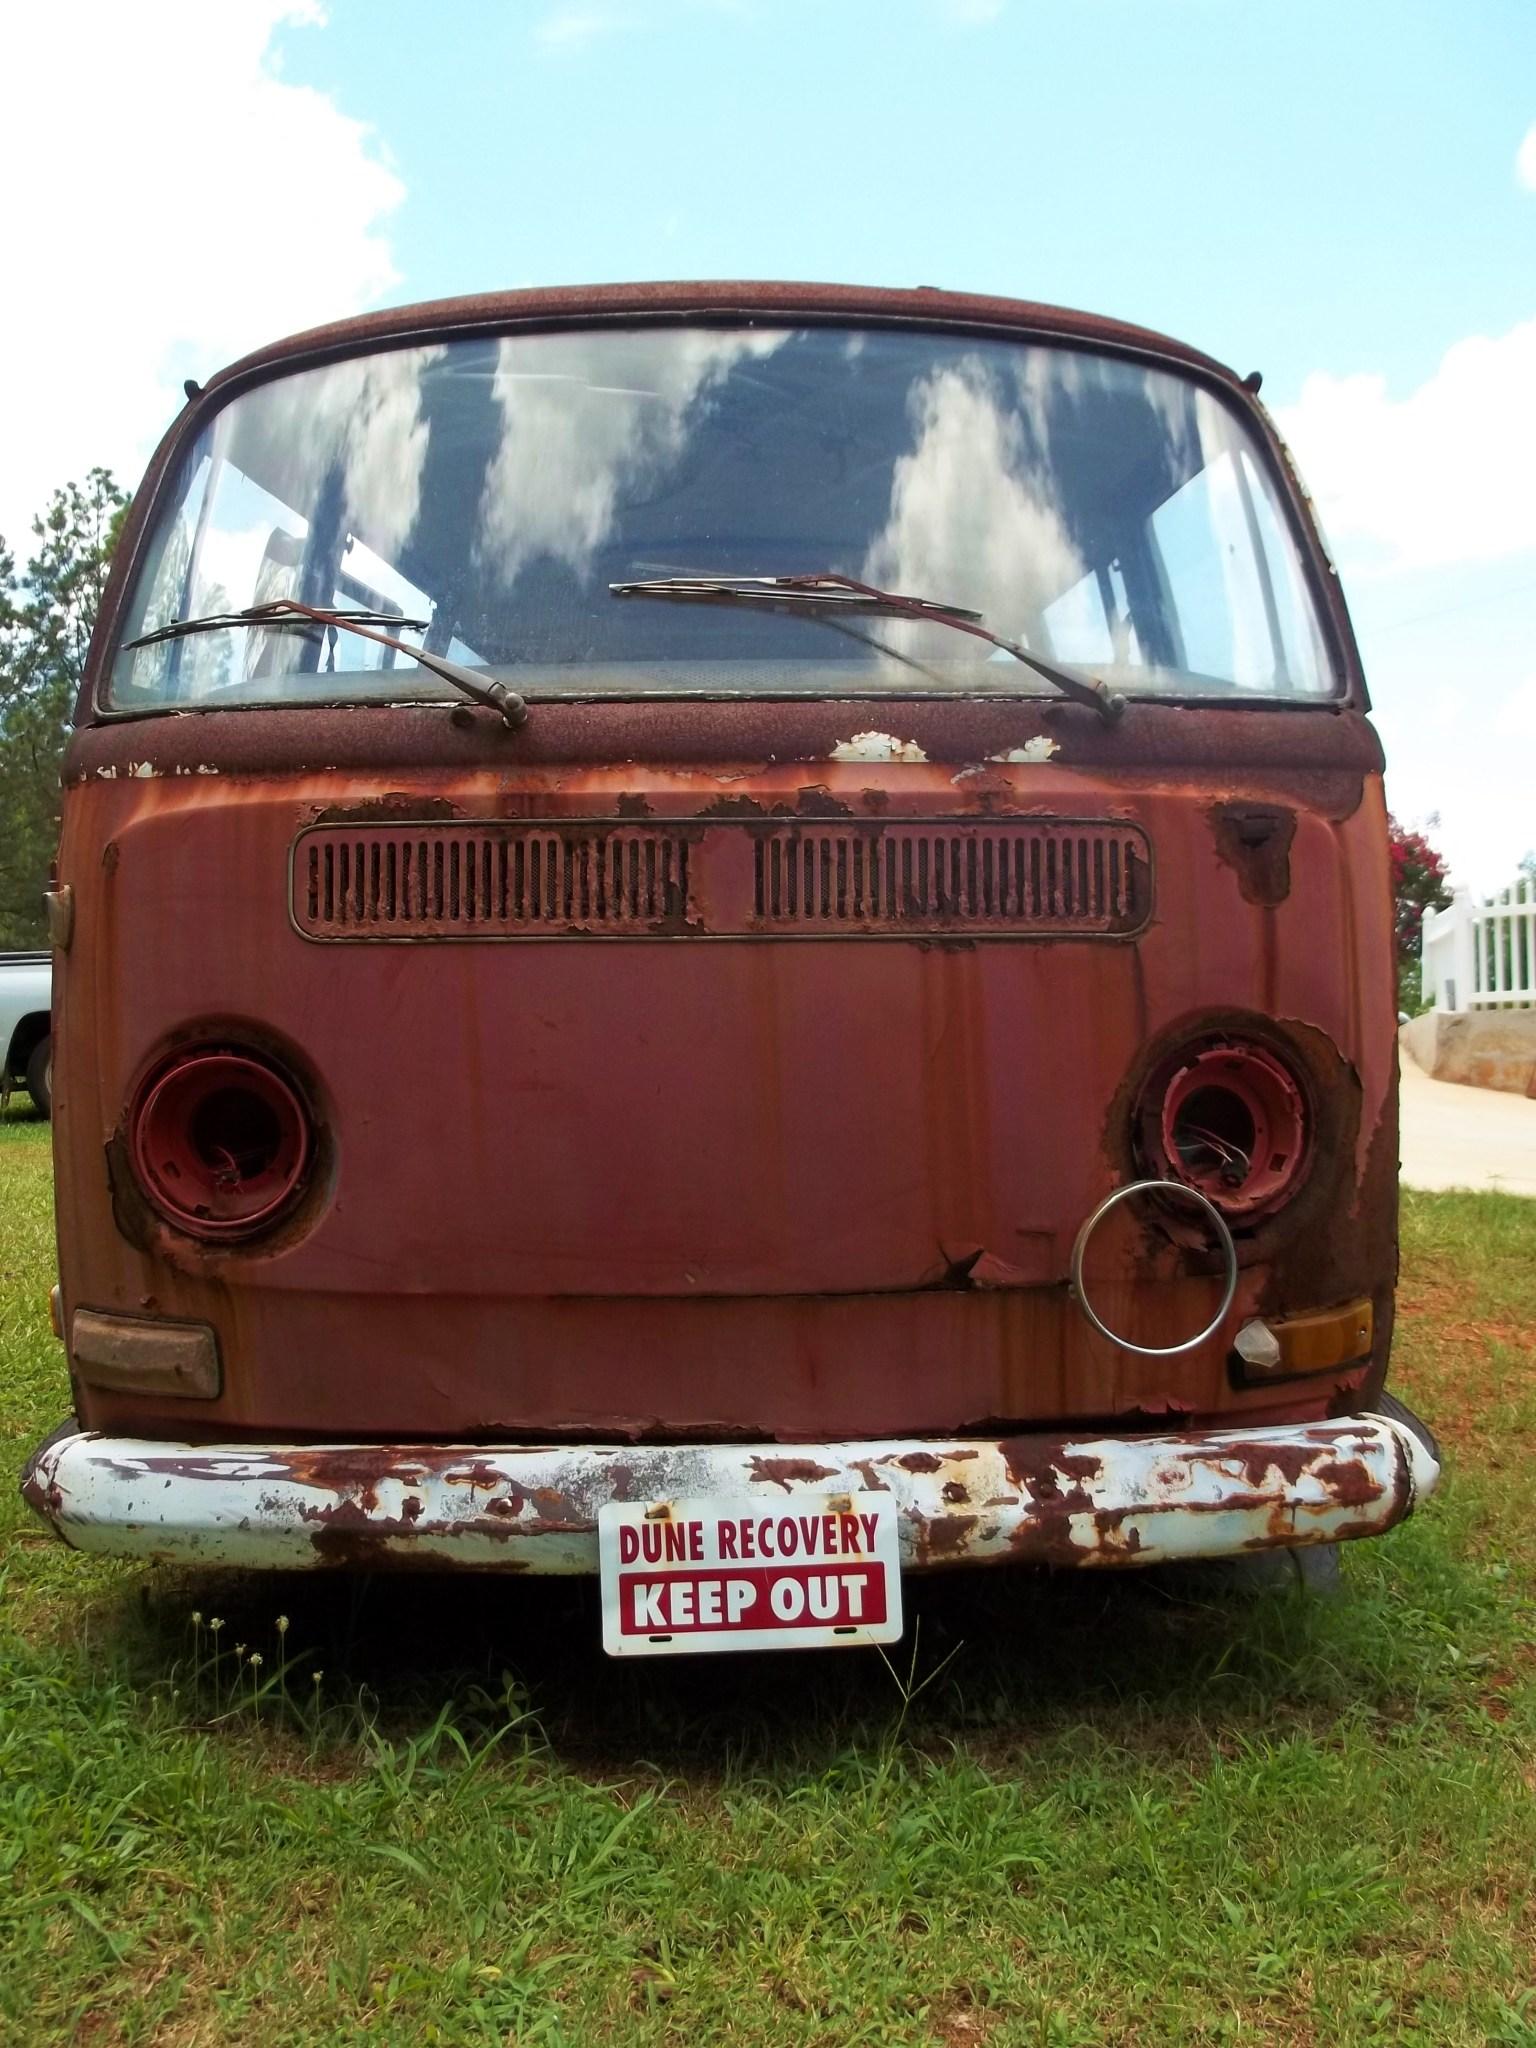 68 Krusty Krab Deluxe bus w/ sunroof 102_1237